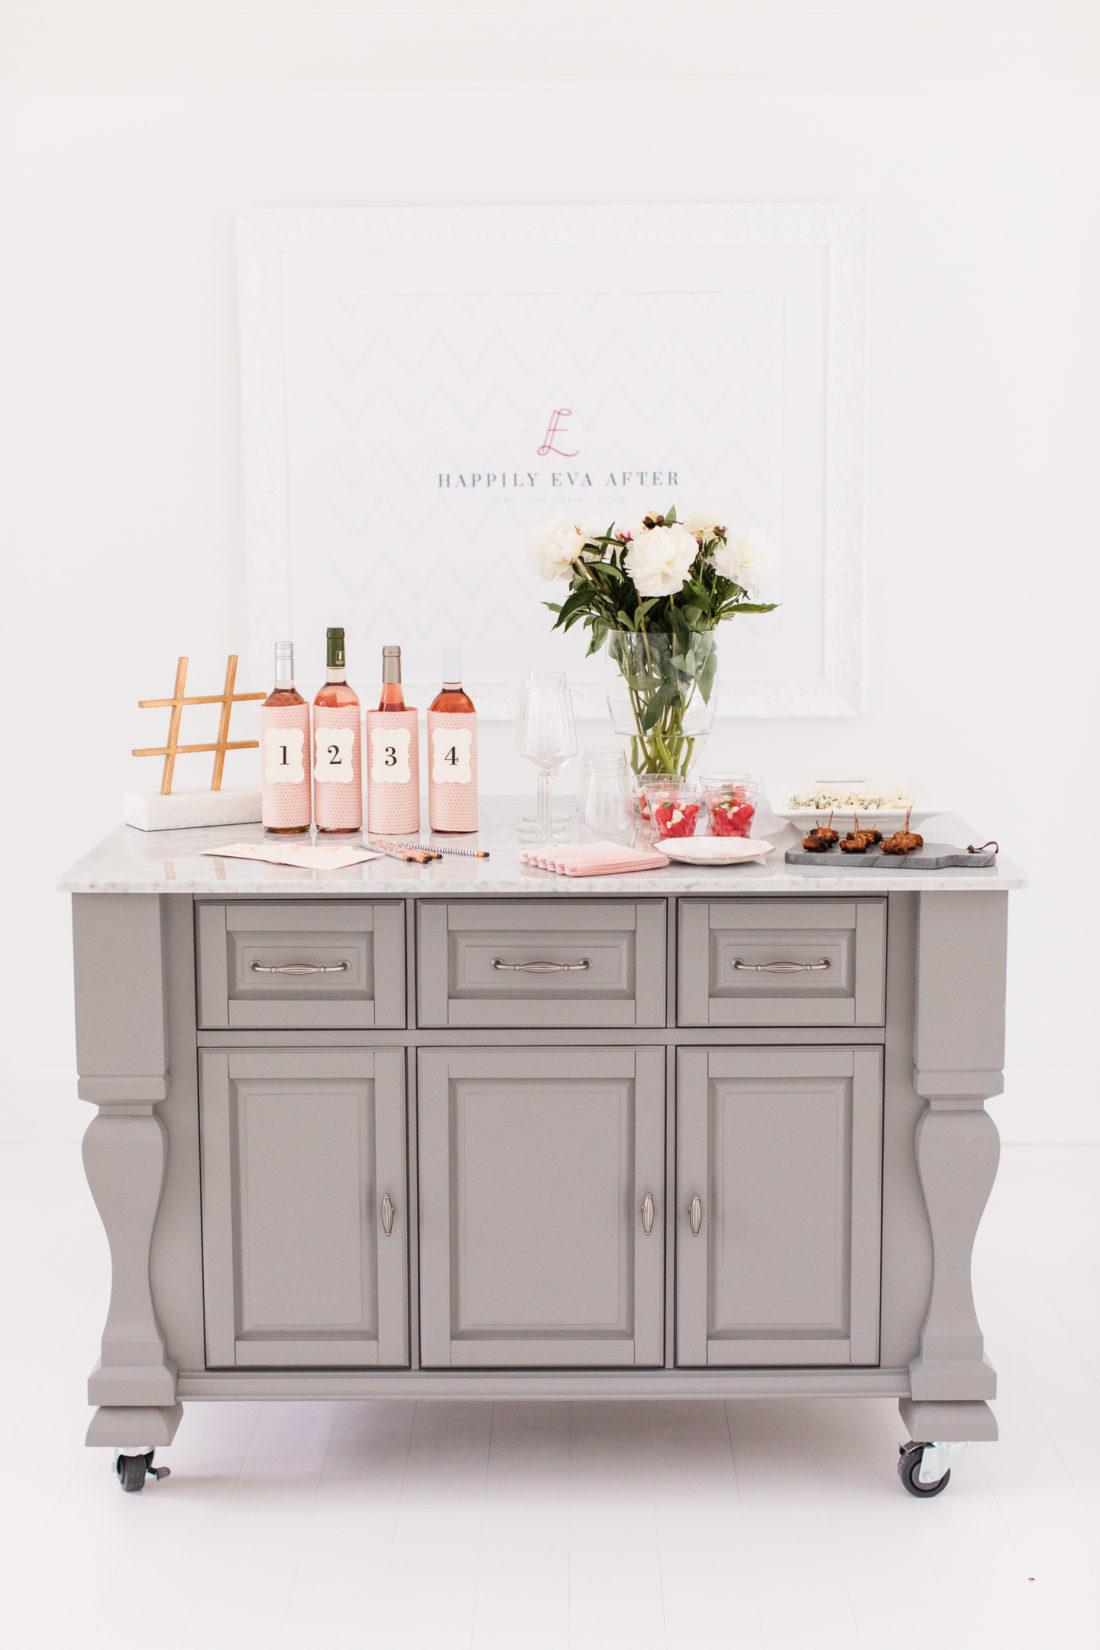 Eva Amurri Martino hosts a fun and feminine Rosé tasting party at her Connecticut home